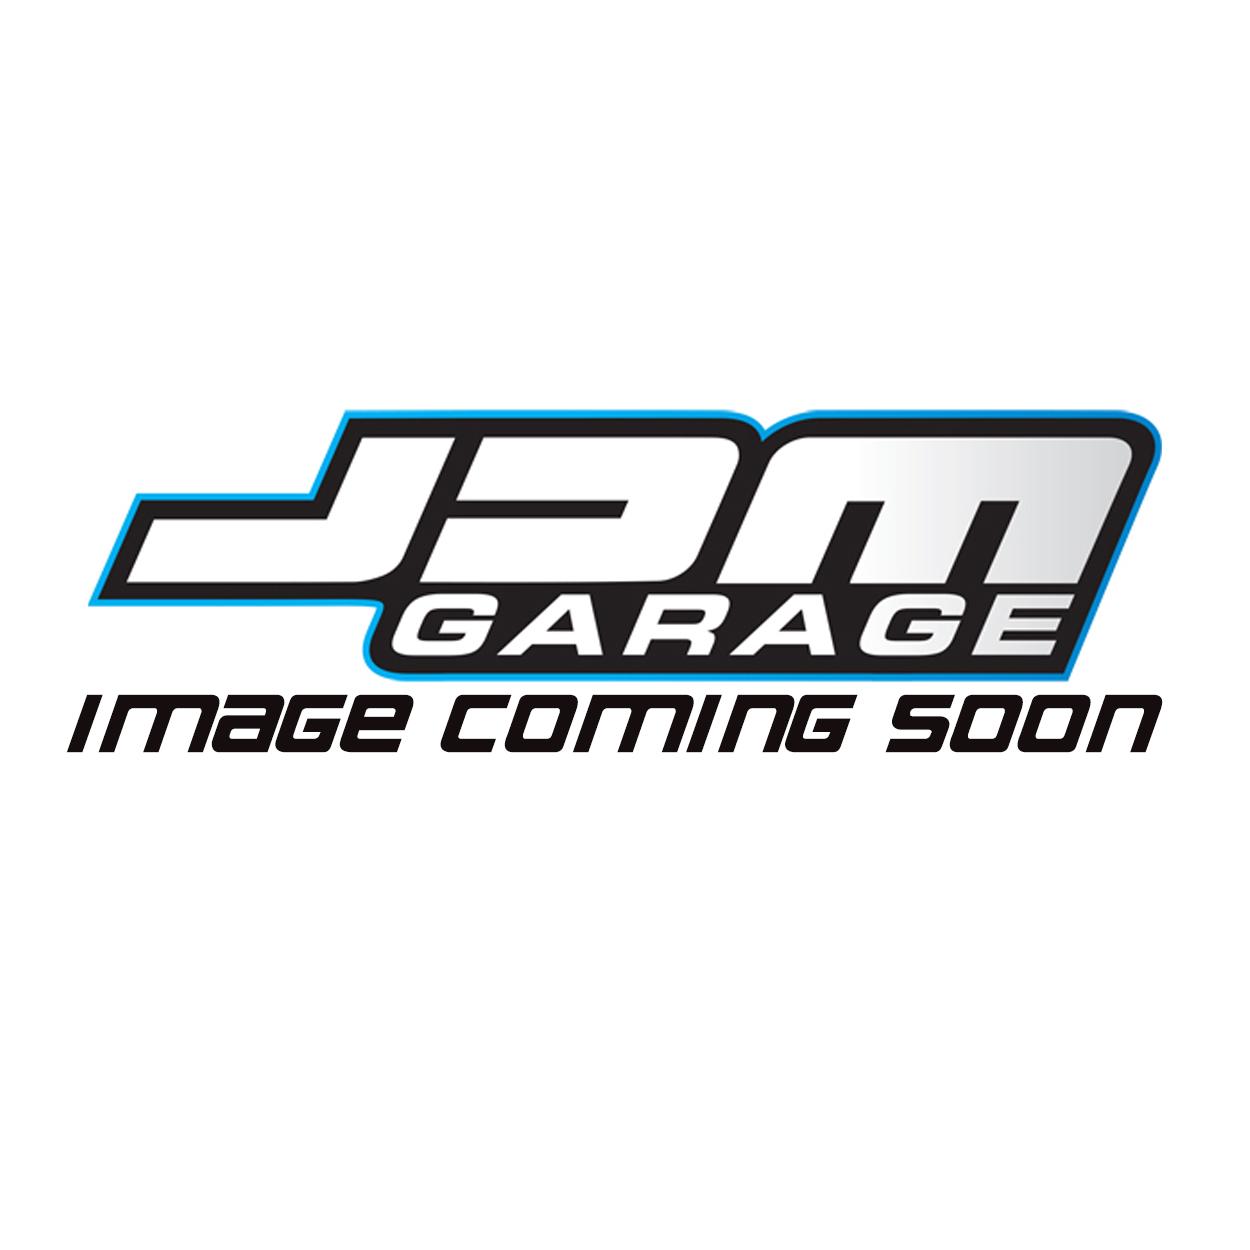 Genuine Front Registration Plate Holder Brackets Toyota Supra MK4 JZA80 52121-24020